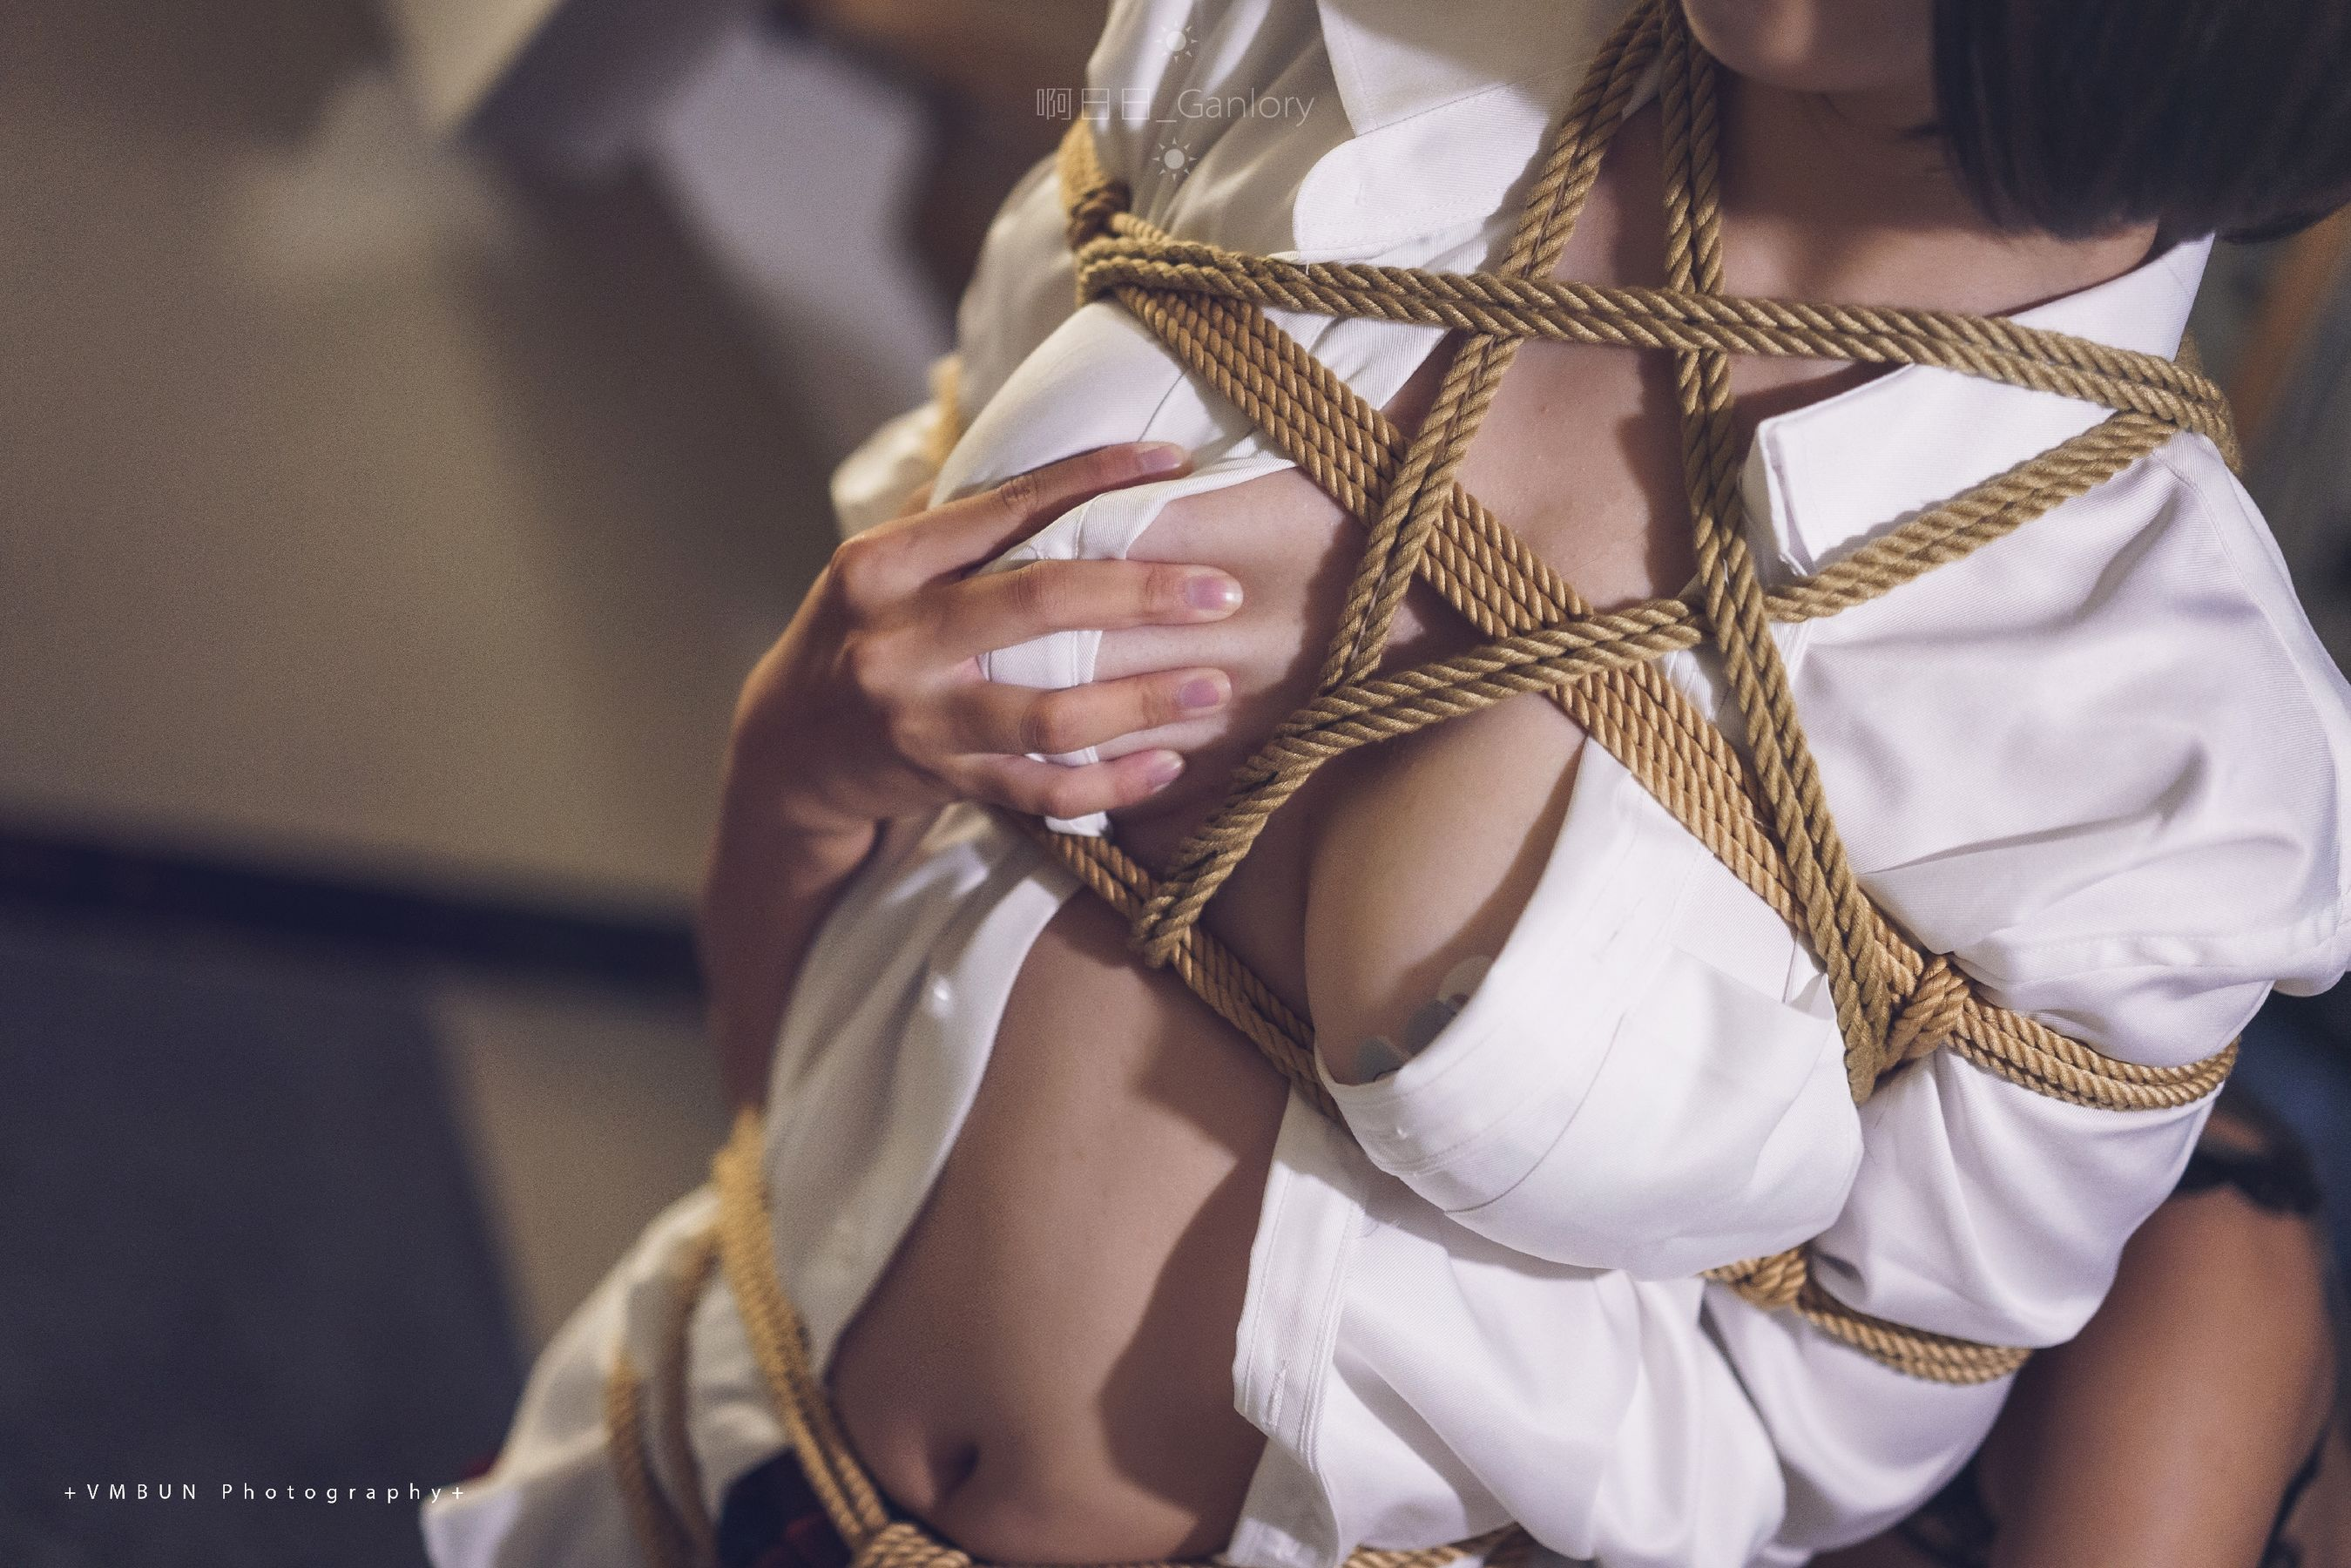 VOL.1345 [网络美女]捆绑绳艺丝袜人体:啊日日_Ganlory超高清写真套图(27P)